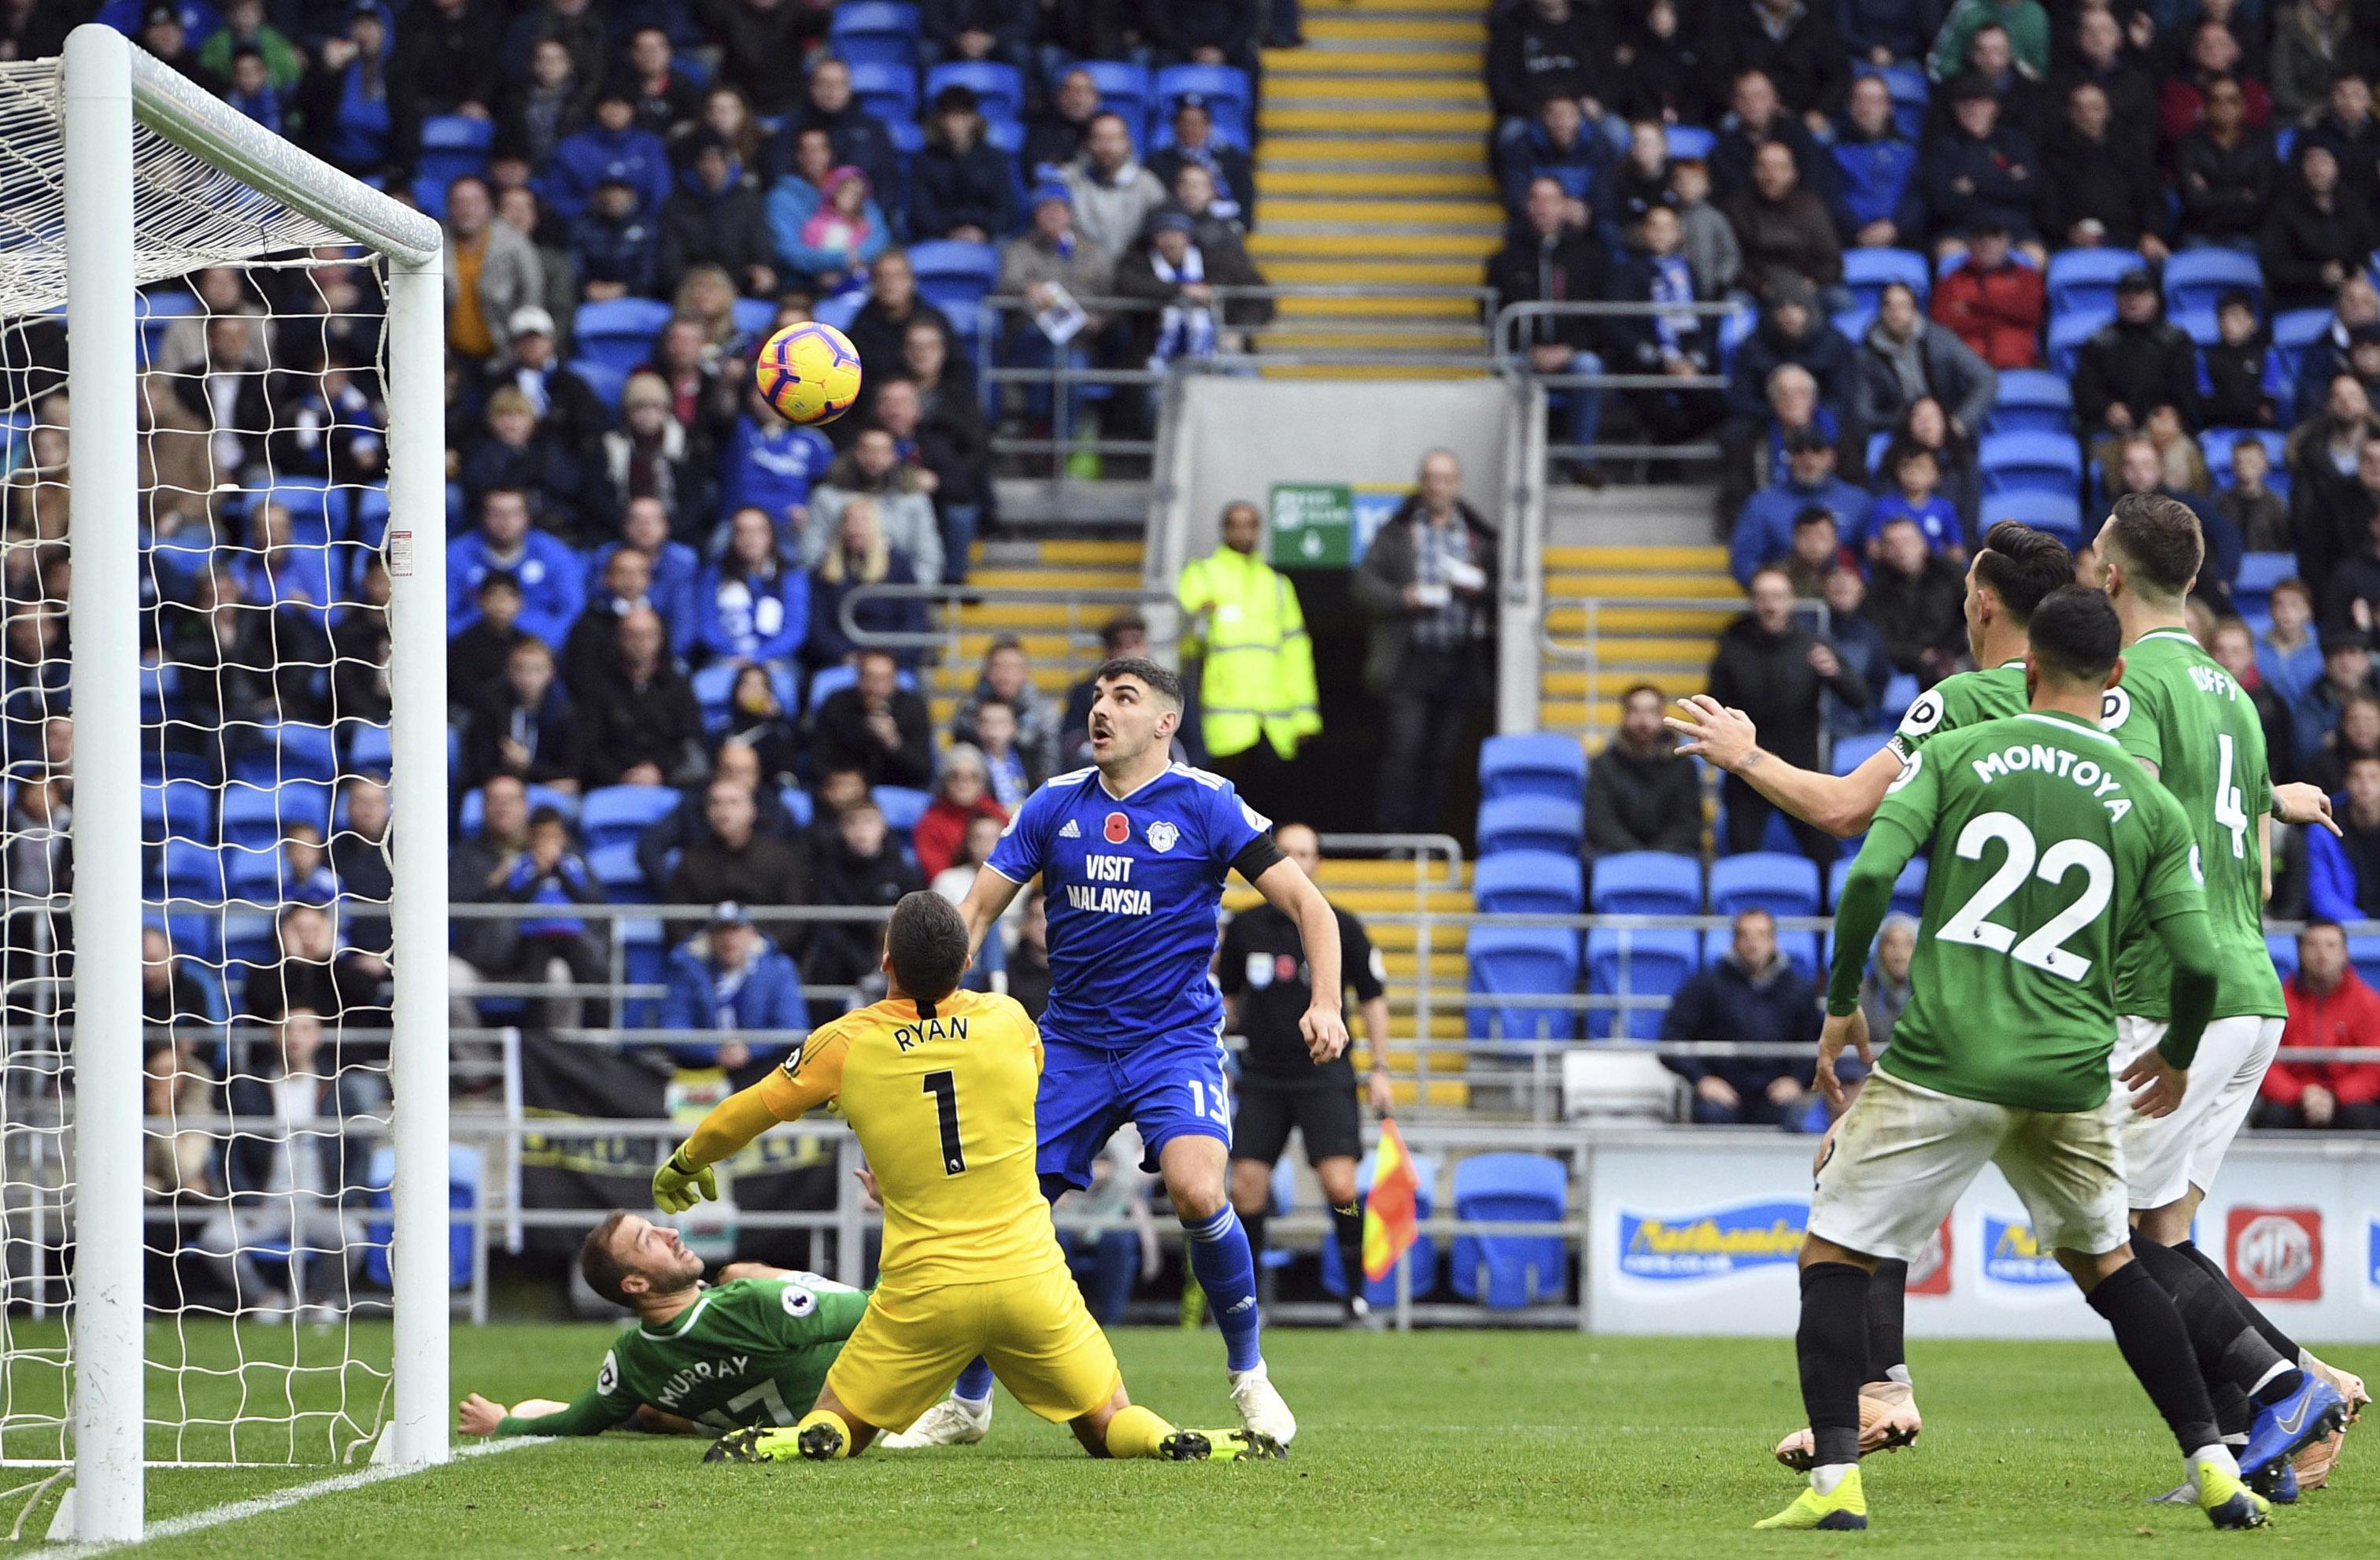 Cardiff grabs 90th-minute winner, beats Brighton 2-1 in EPL